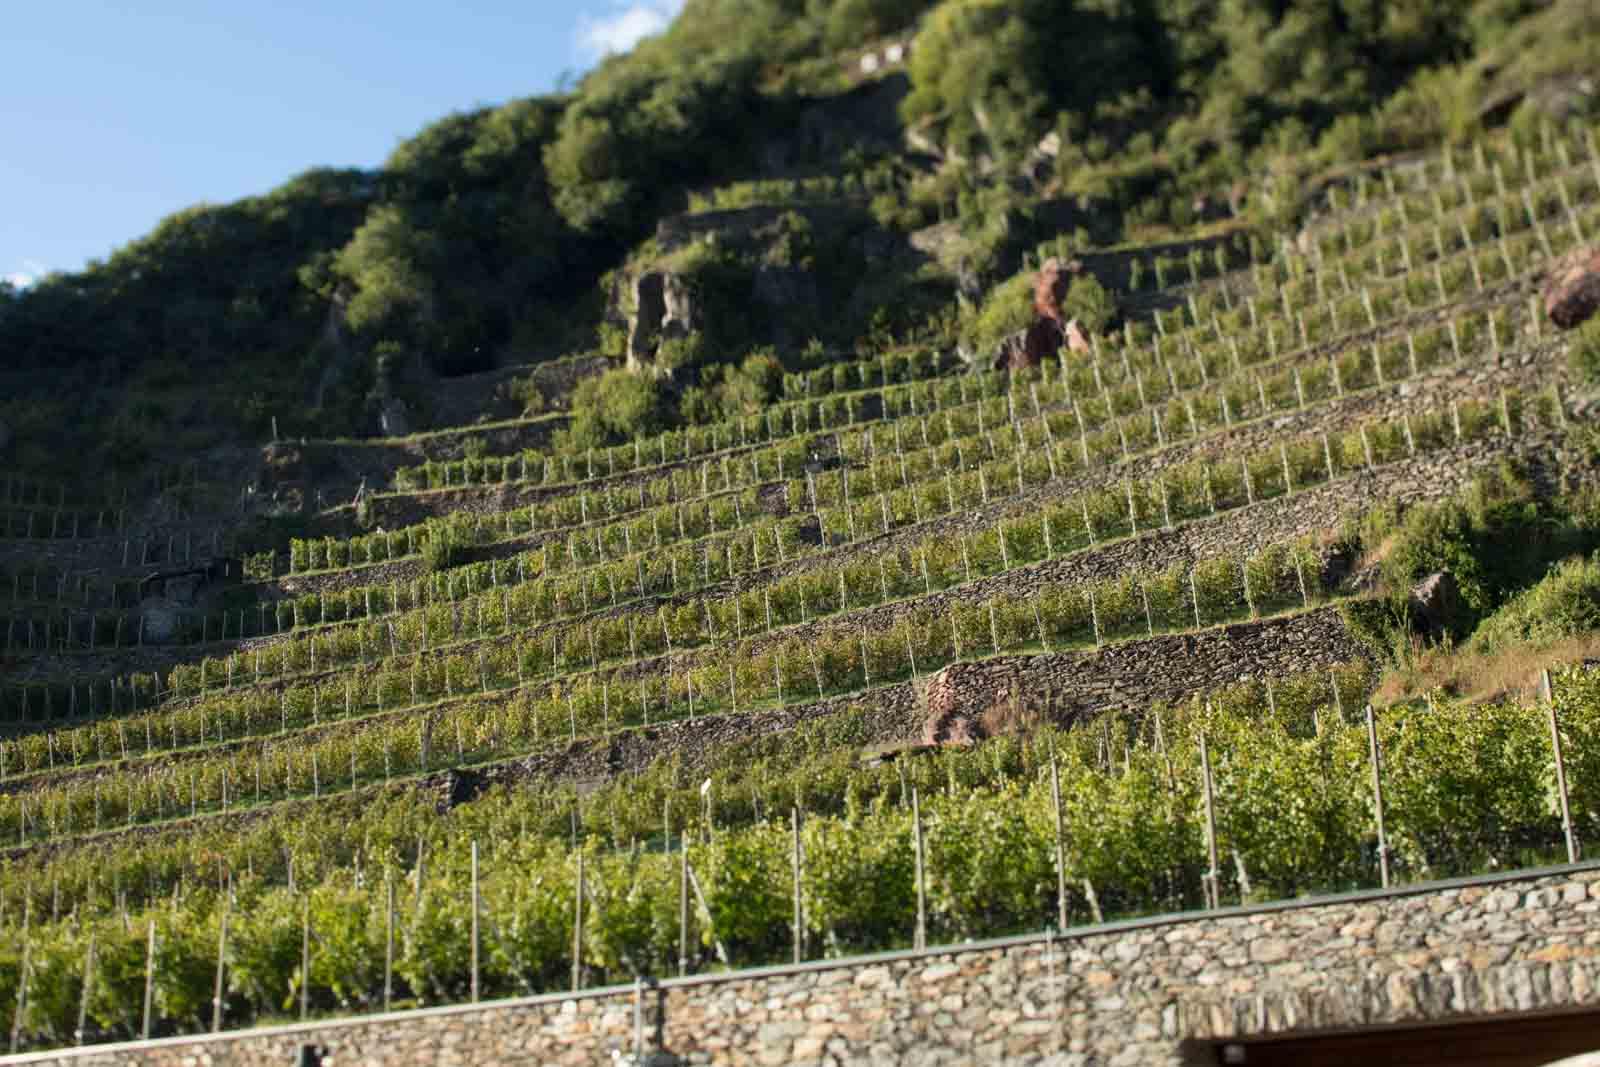 ARPEPE's Rocca de Piro vineyard in the Valtellina Superiore Grumello zone. ©Kevin Day / Opening a Bottle